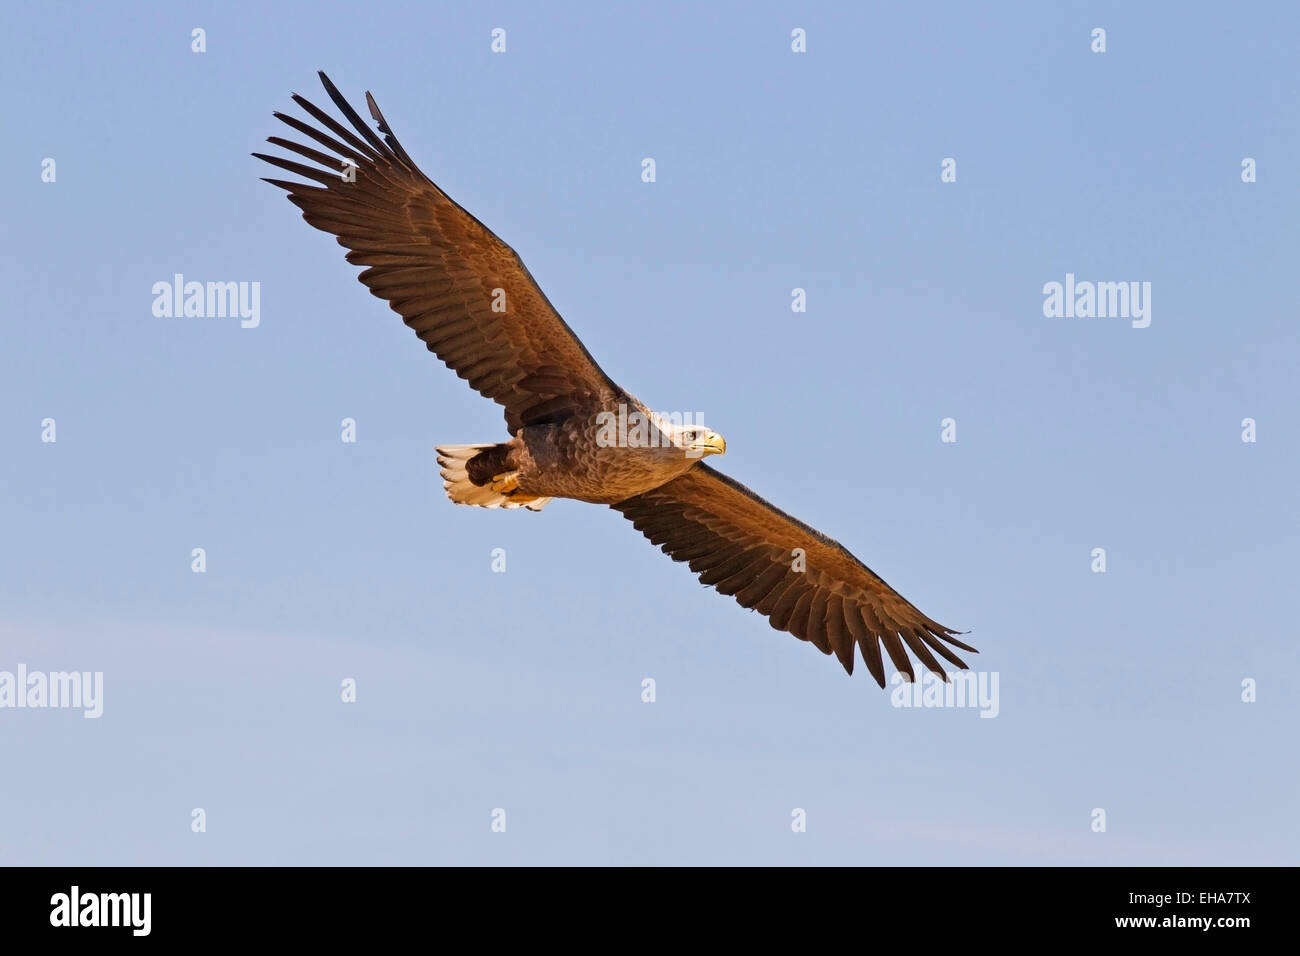 White-tailed Eagle (Haliaeetus albicilla), single adult in flight against blue sky Stock Photo